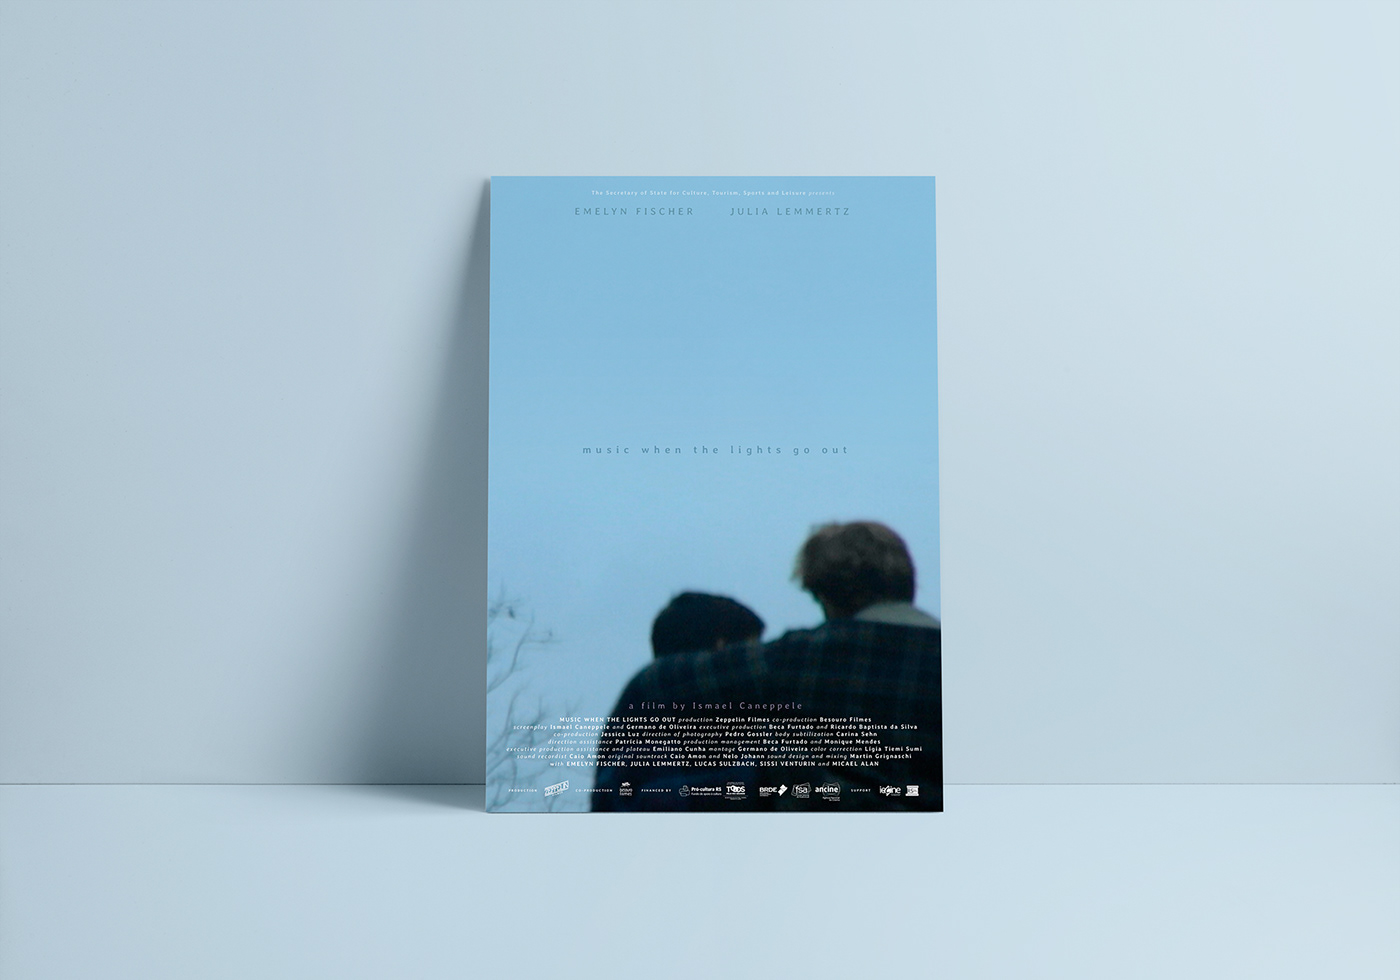 movie Film   ismael caneppele julia lemmertz zeppelin filmes indie films